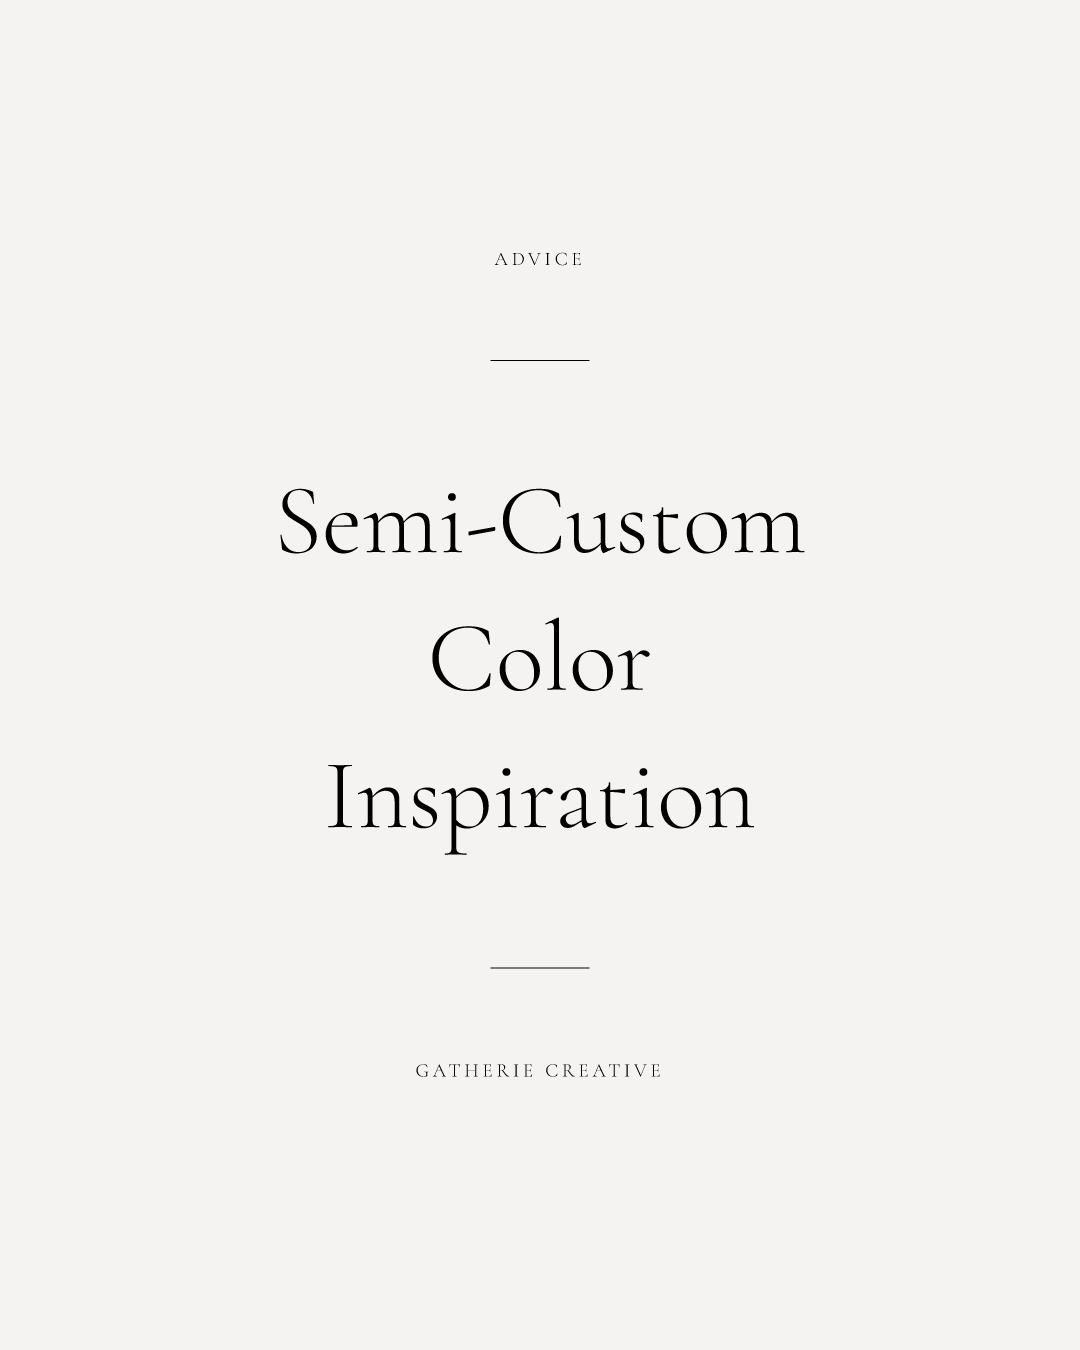 semi-custom color inspiration